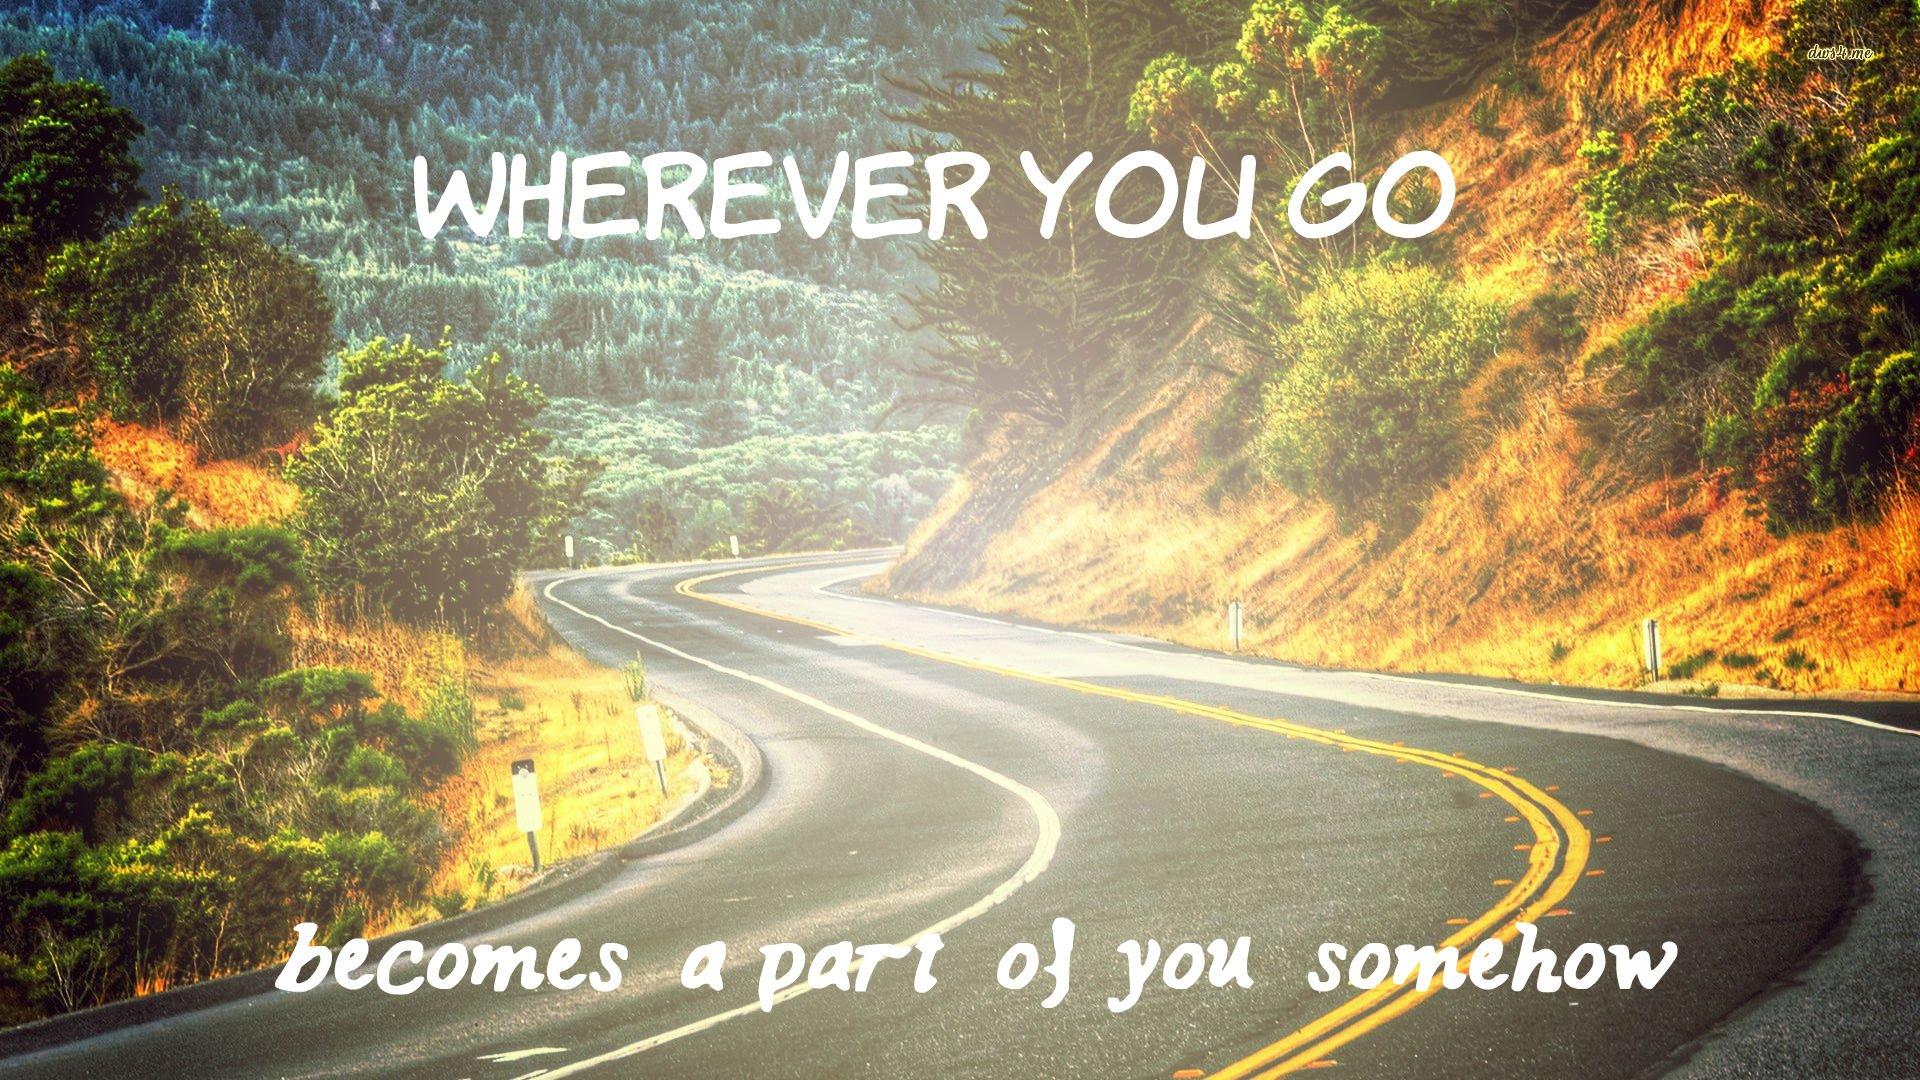 Travel quotes (9)